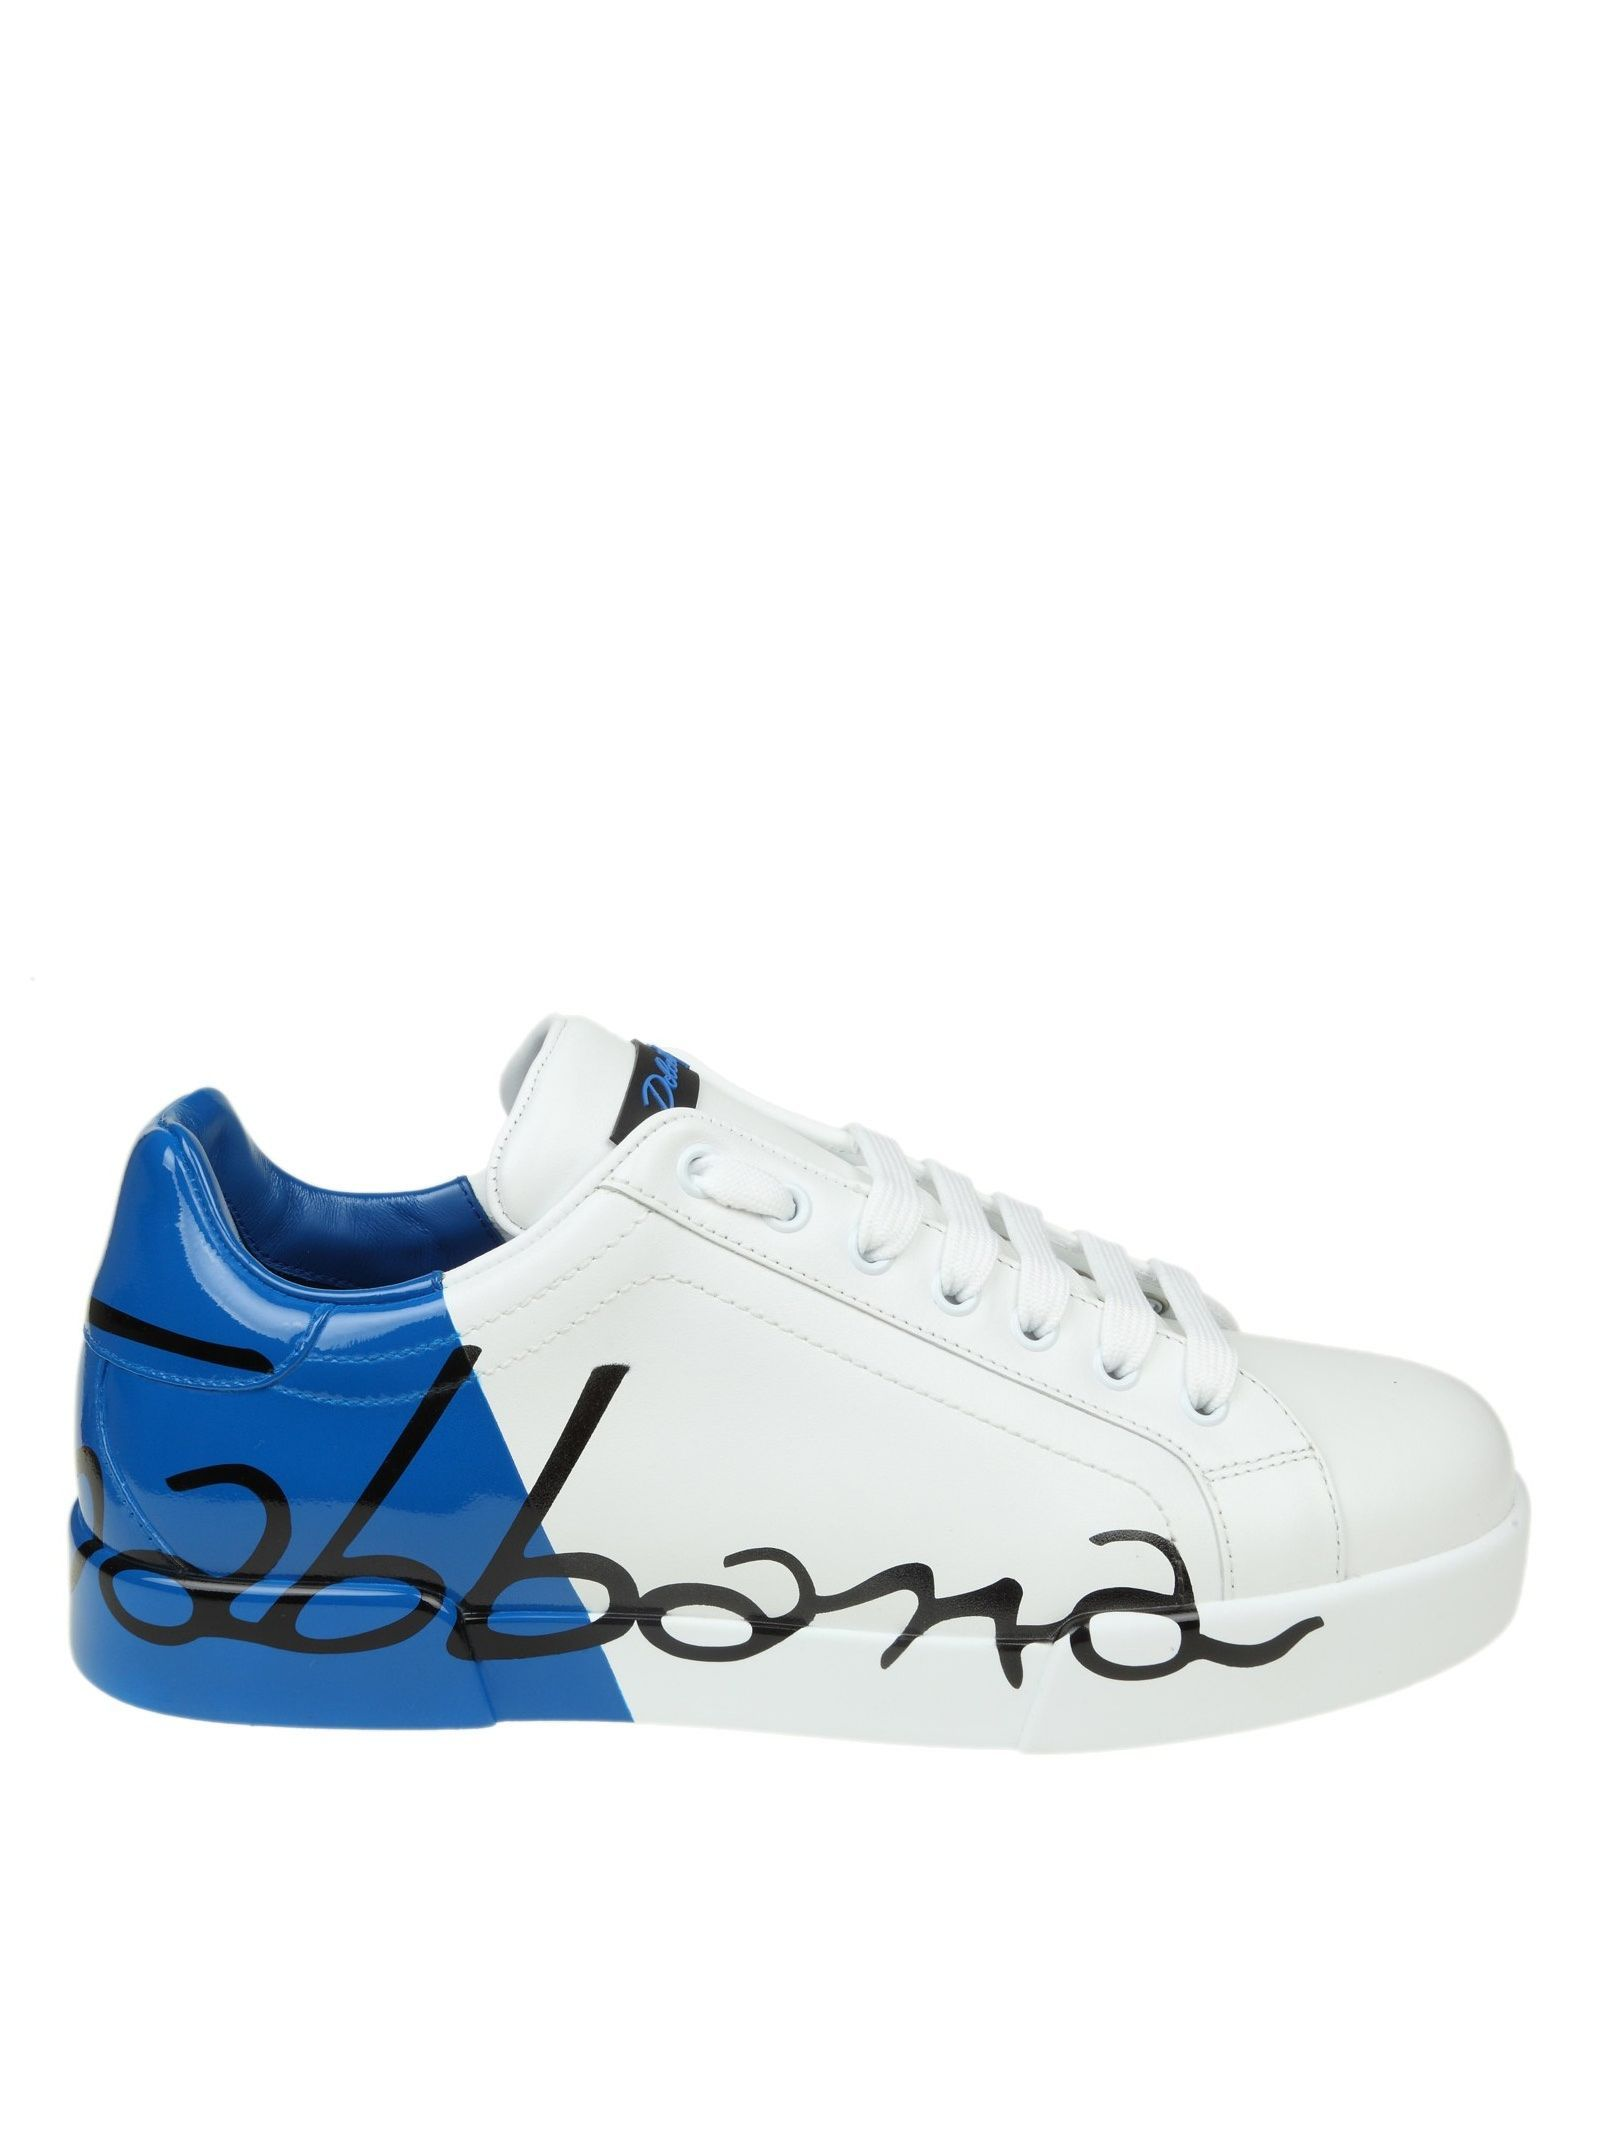 Dolce \u0026 Gabbana Sneakers London With